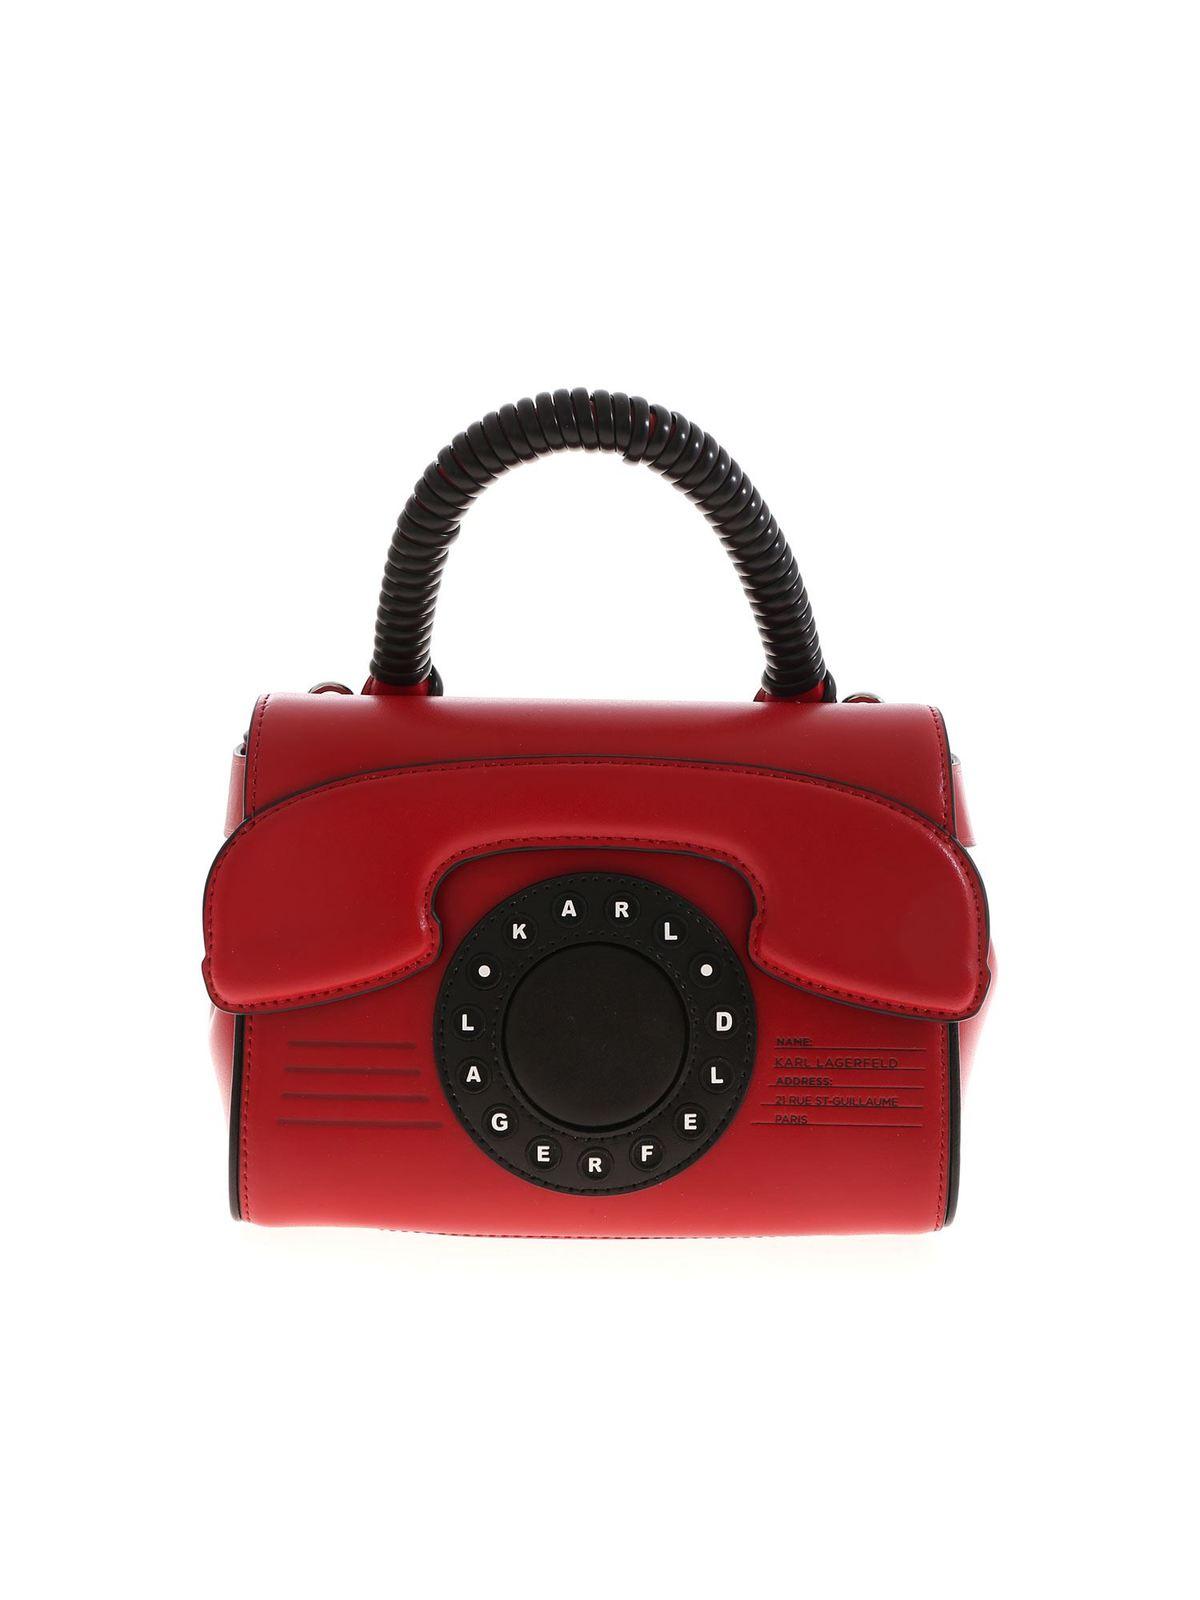 Karl Lagerfeld Leathers KIKONIK TELEPHONE BAG IN RED